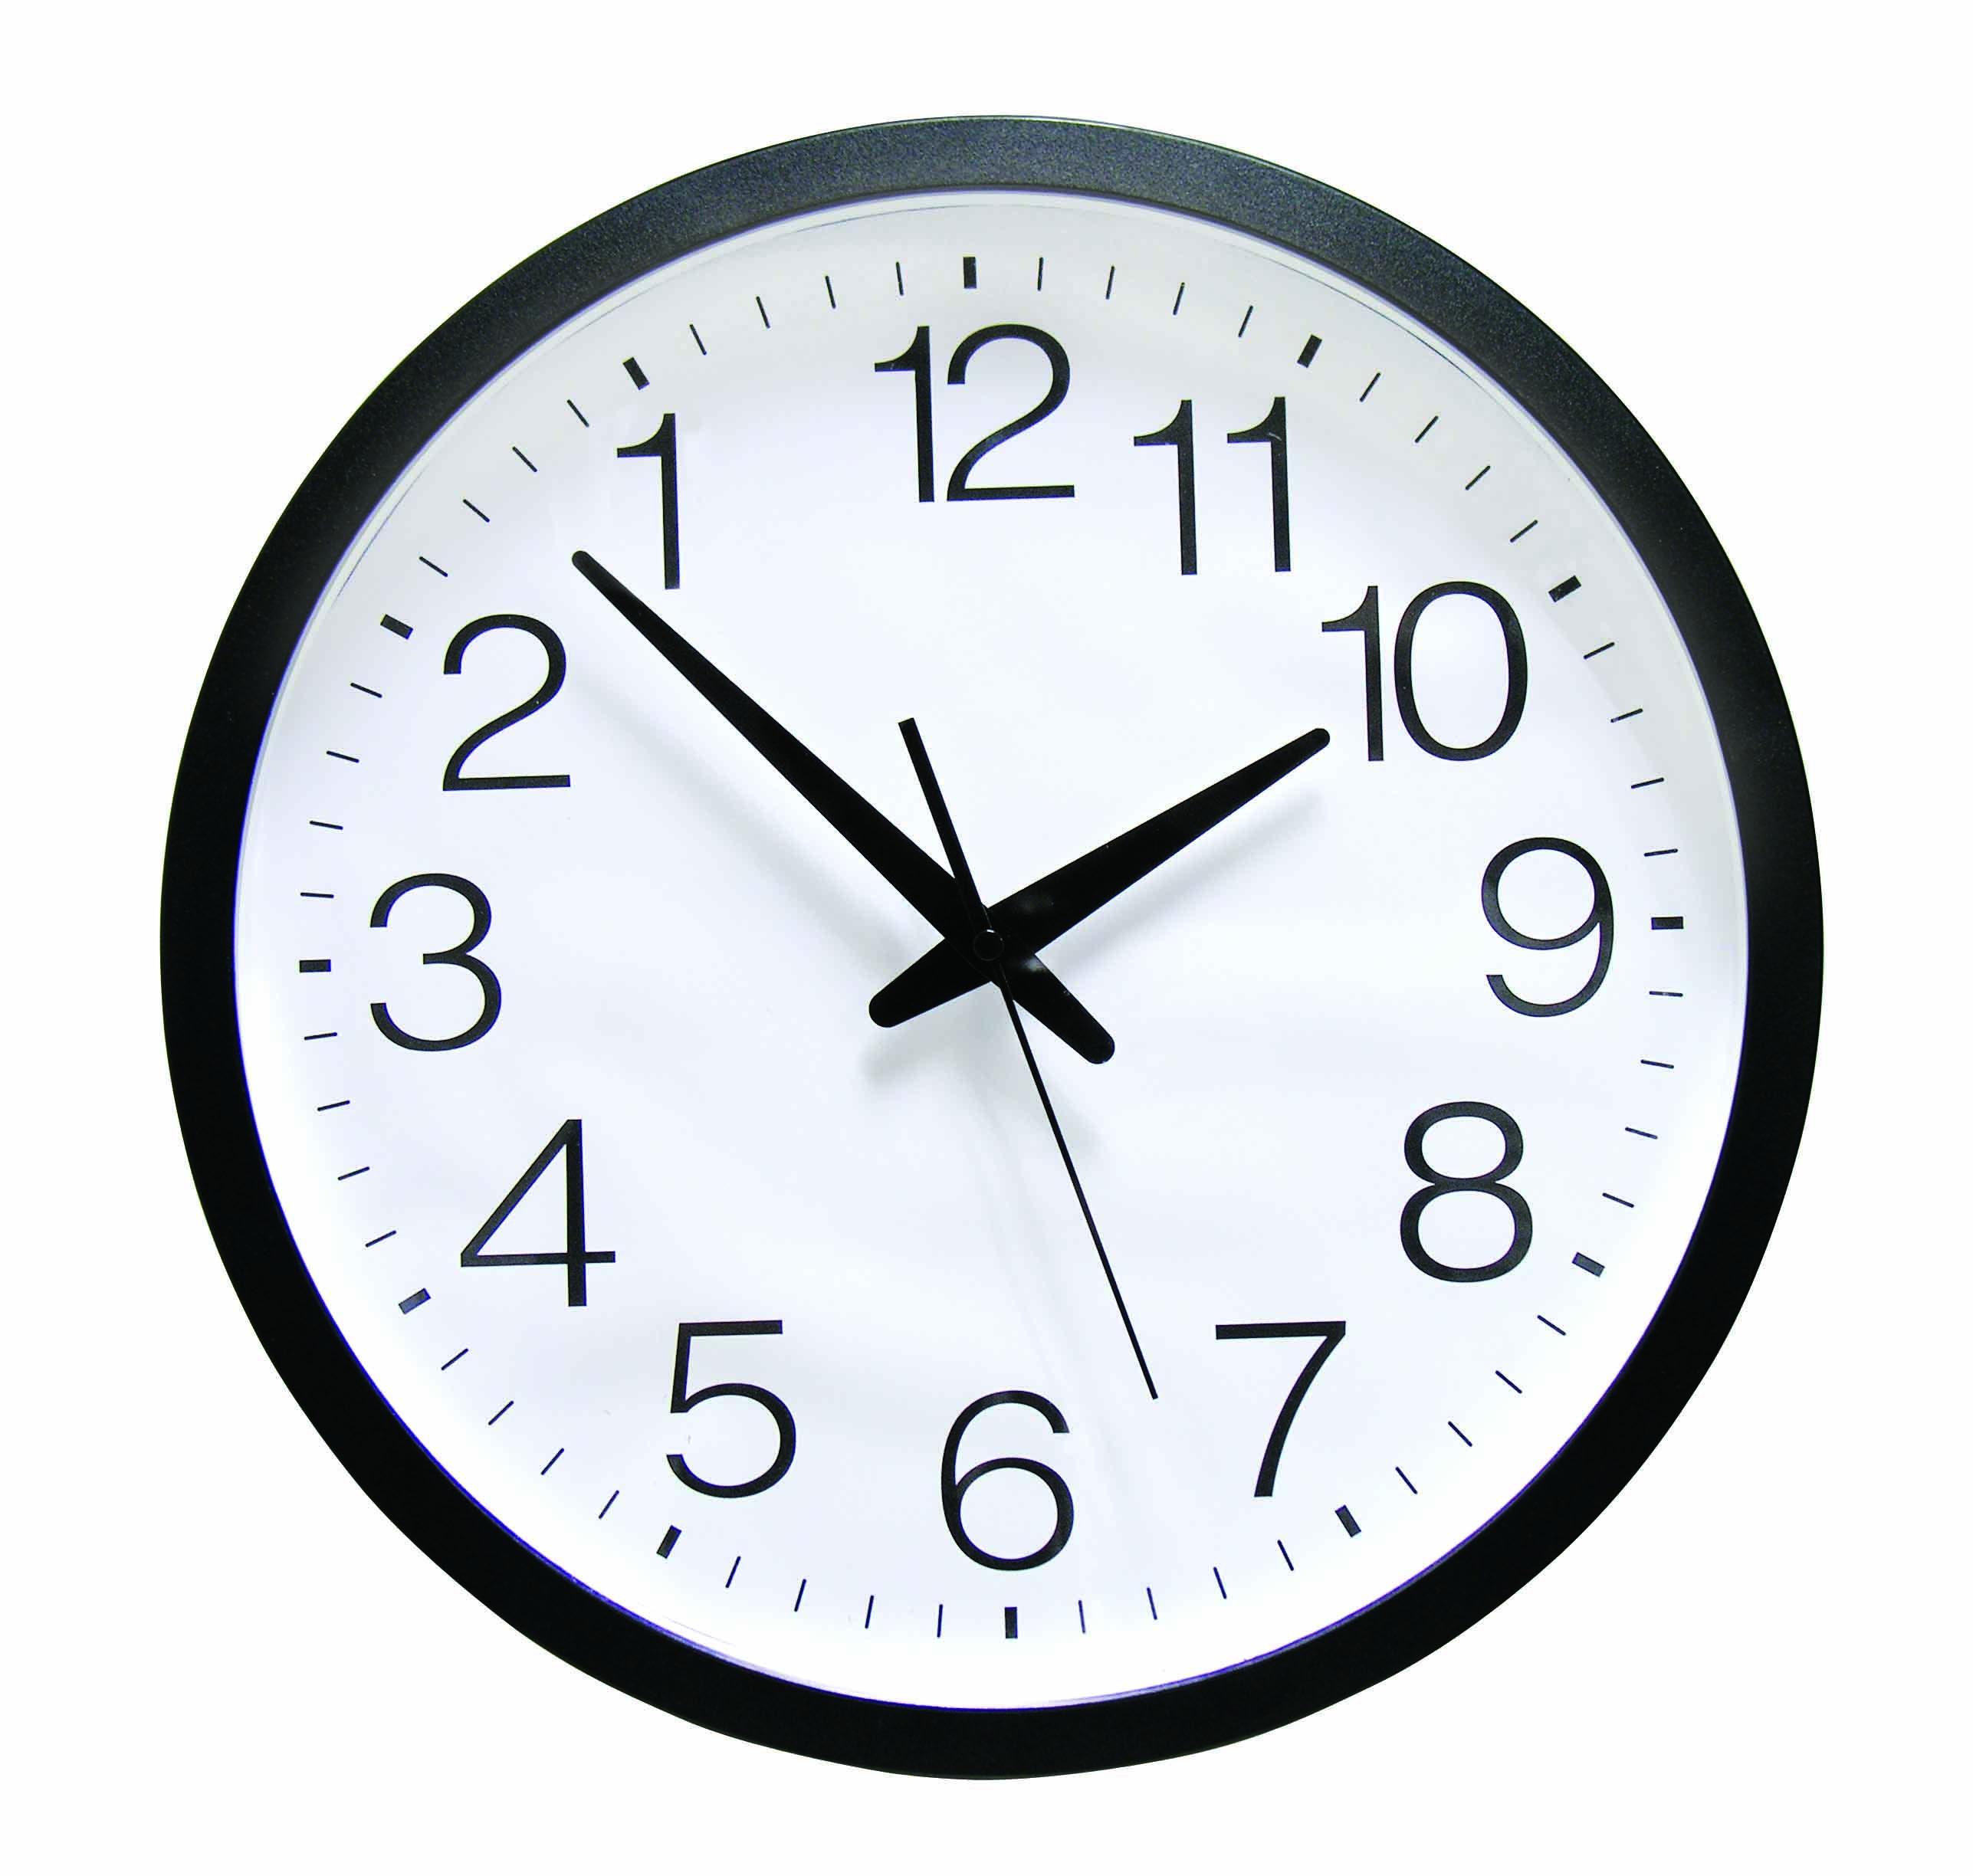 Reversed clipart clock 654_3_dscn1366_original Clock Backwards Storenvy on